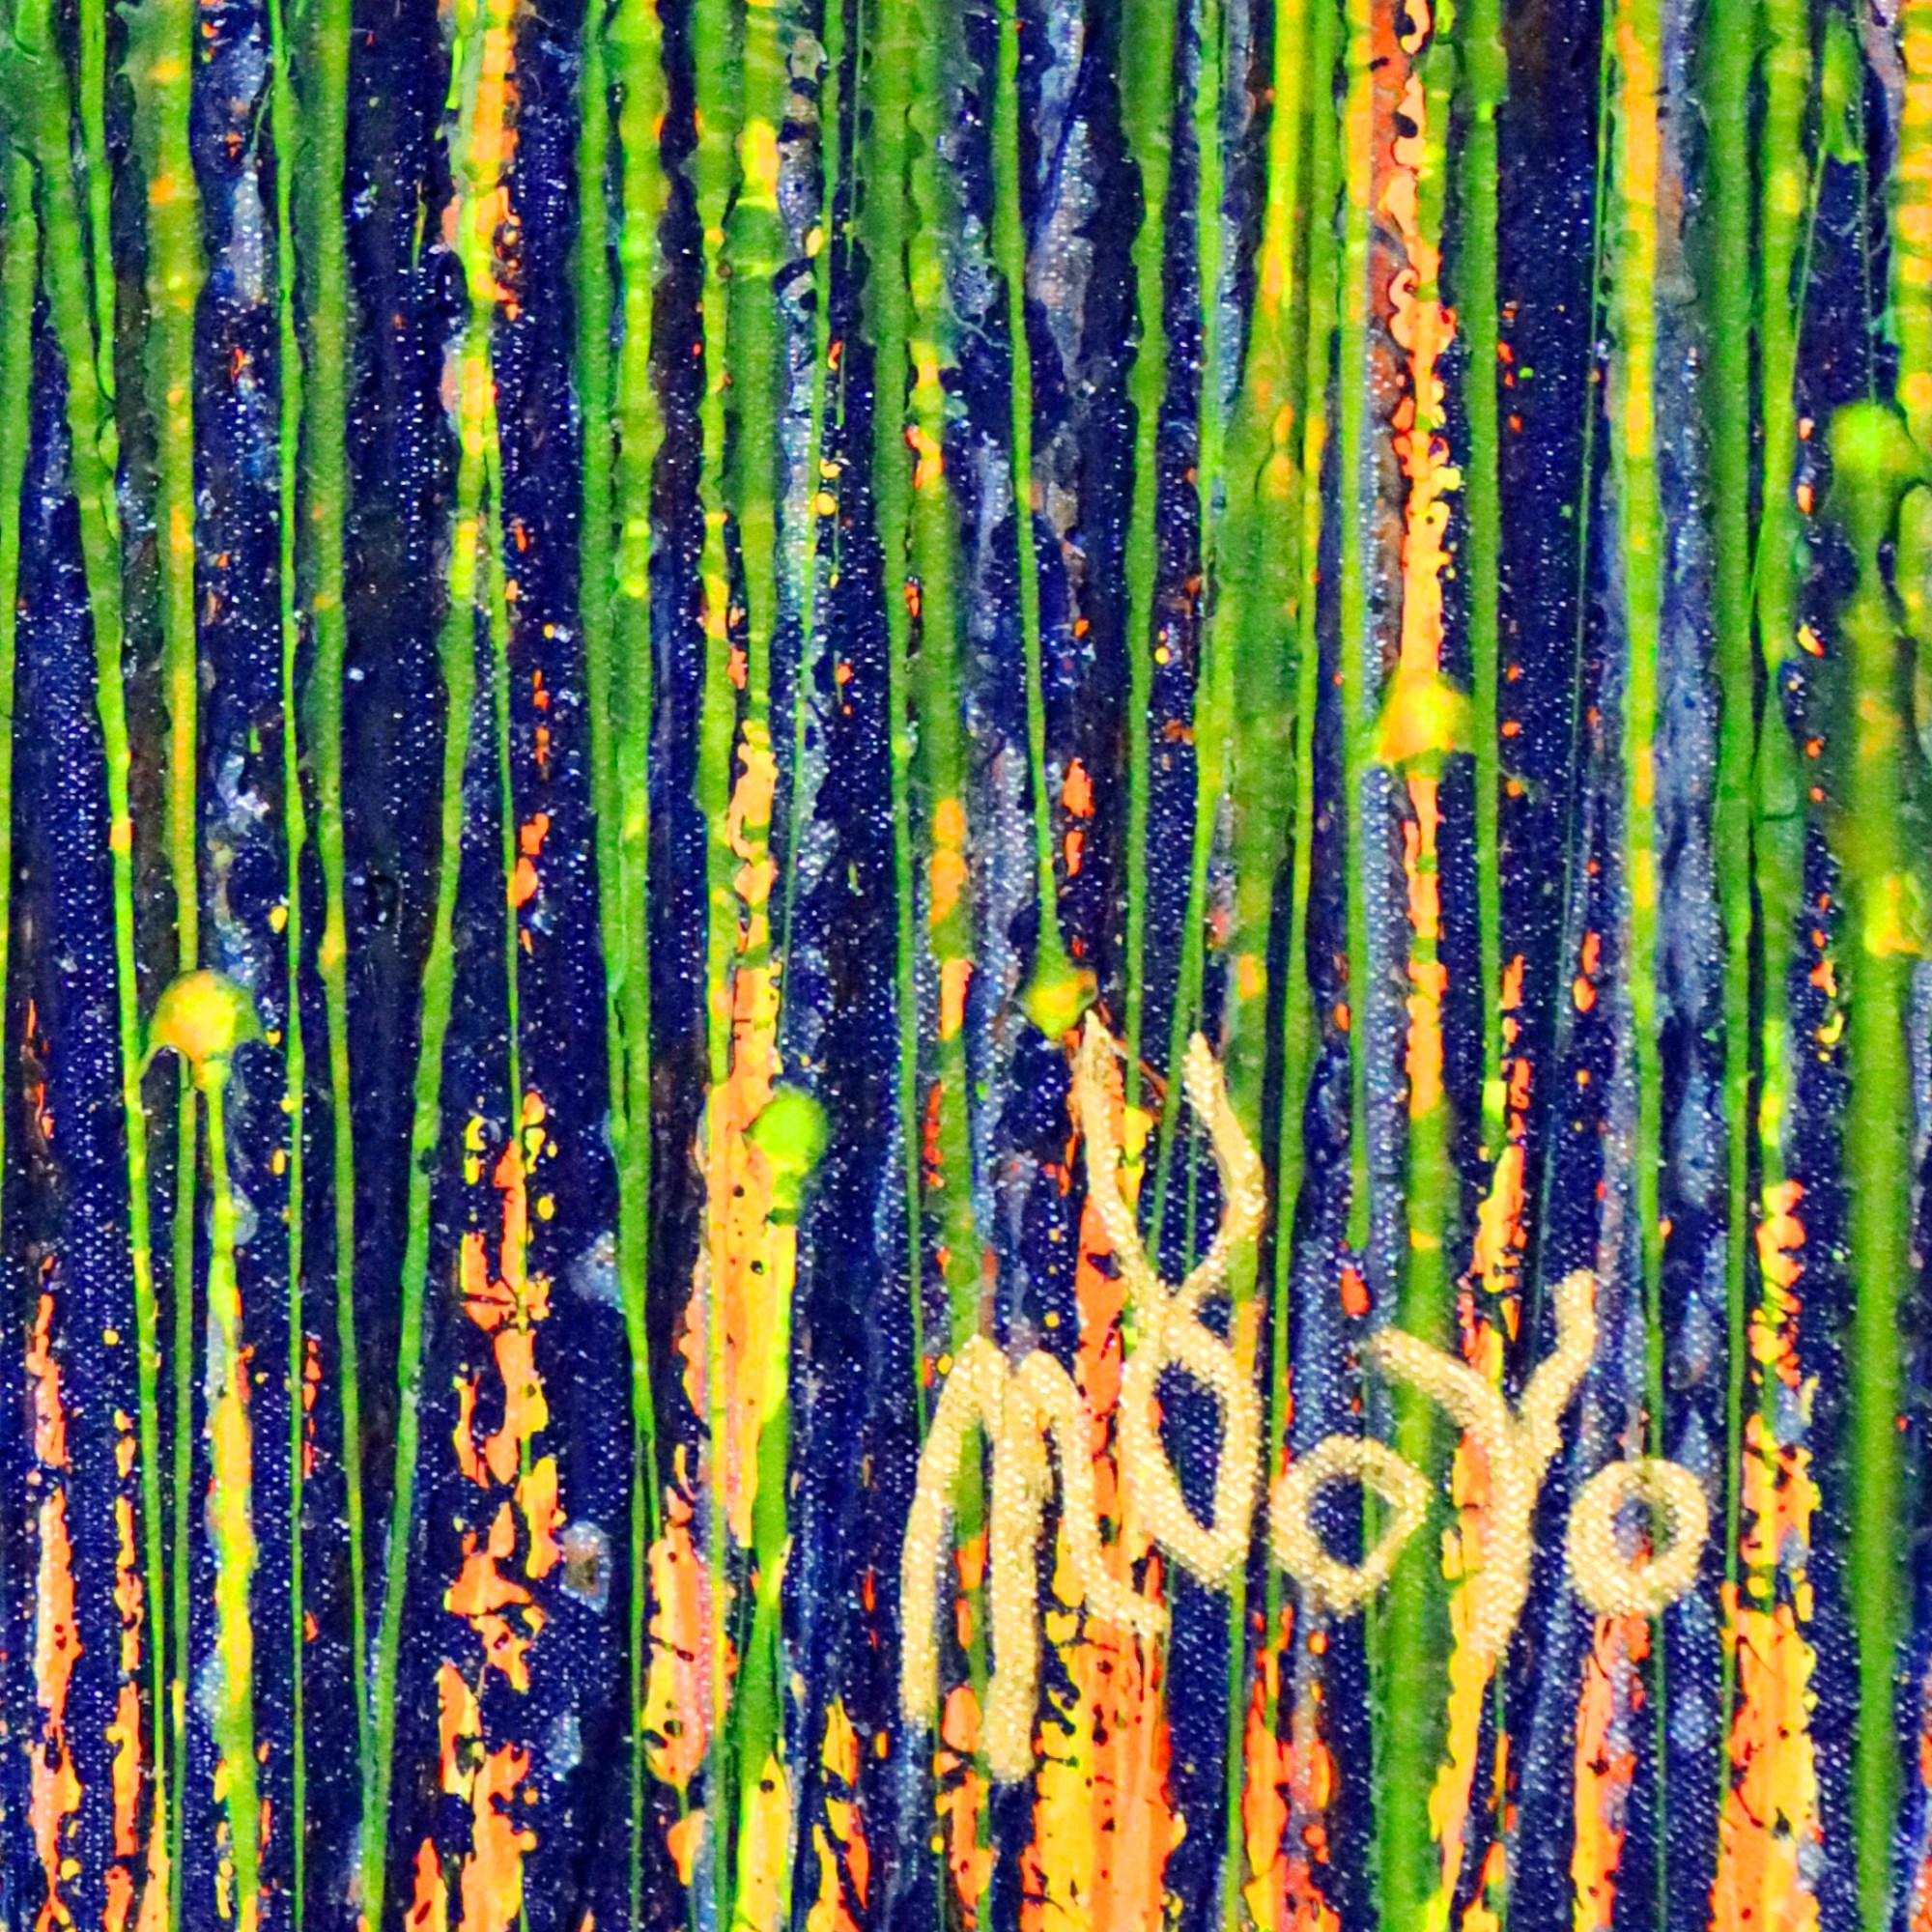 SOLD - Garden in motion 2 (2020) by Nestor Toro